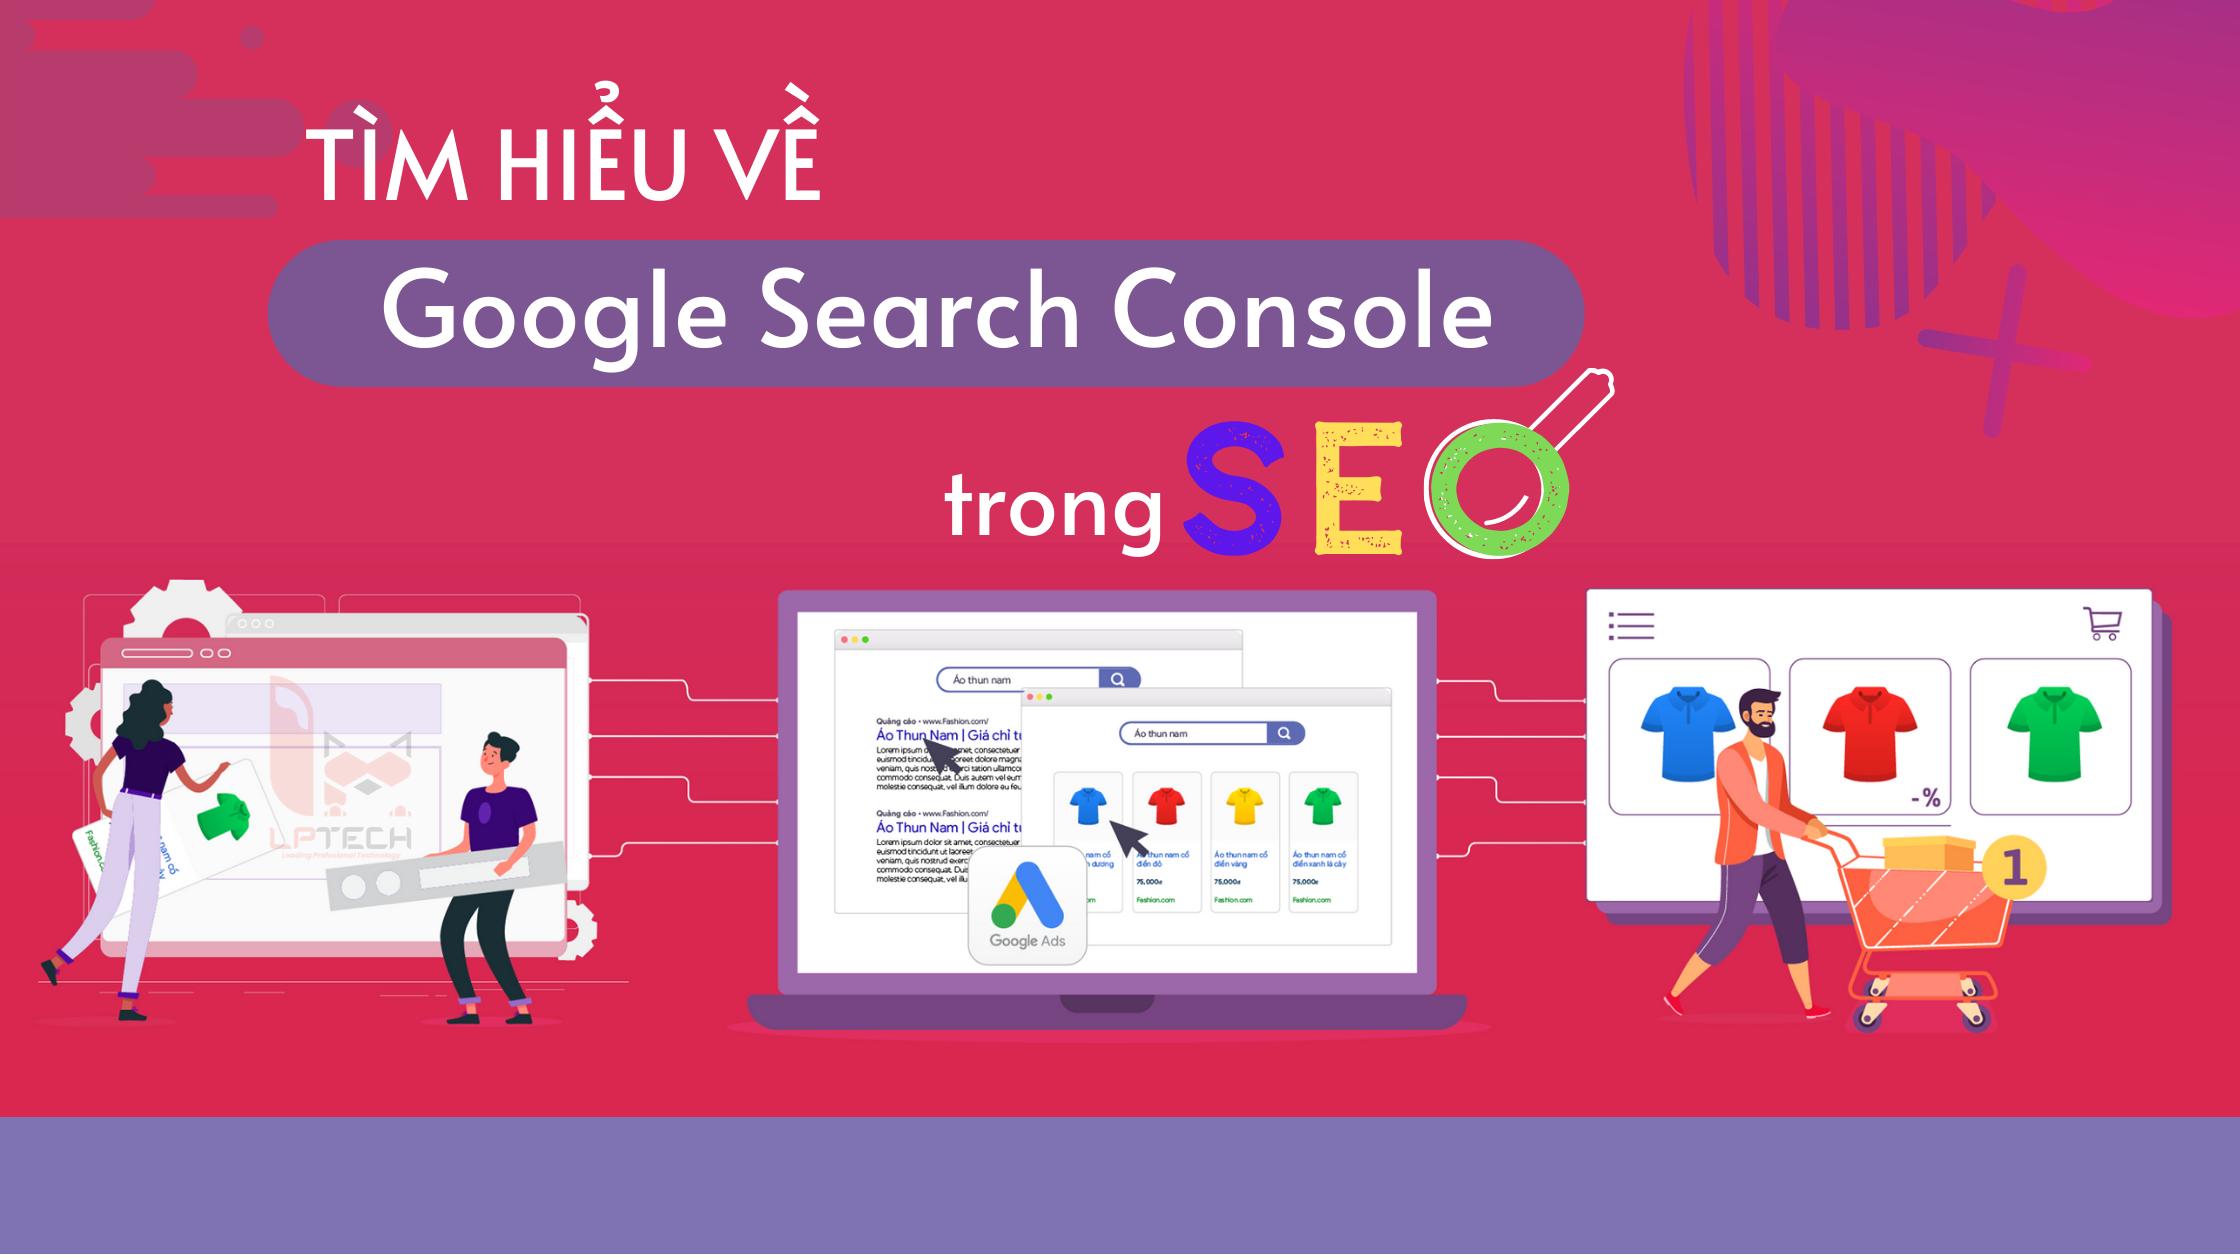 Tìm hiểu về google search console trong seo